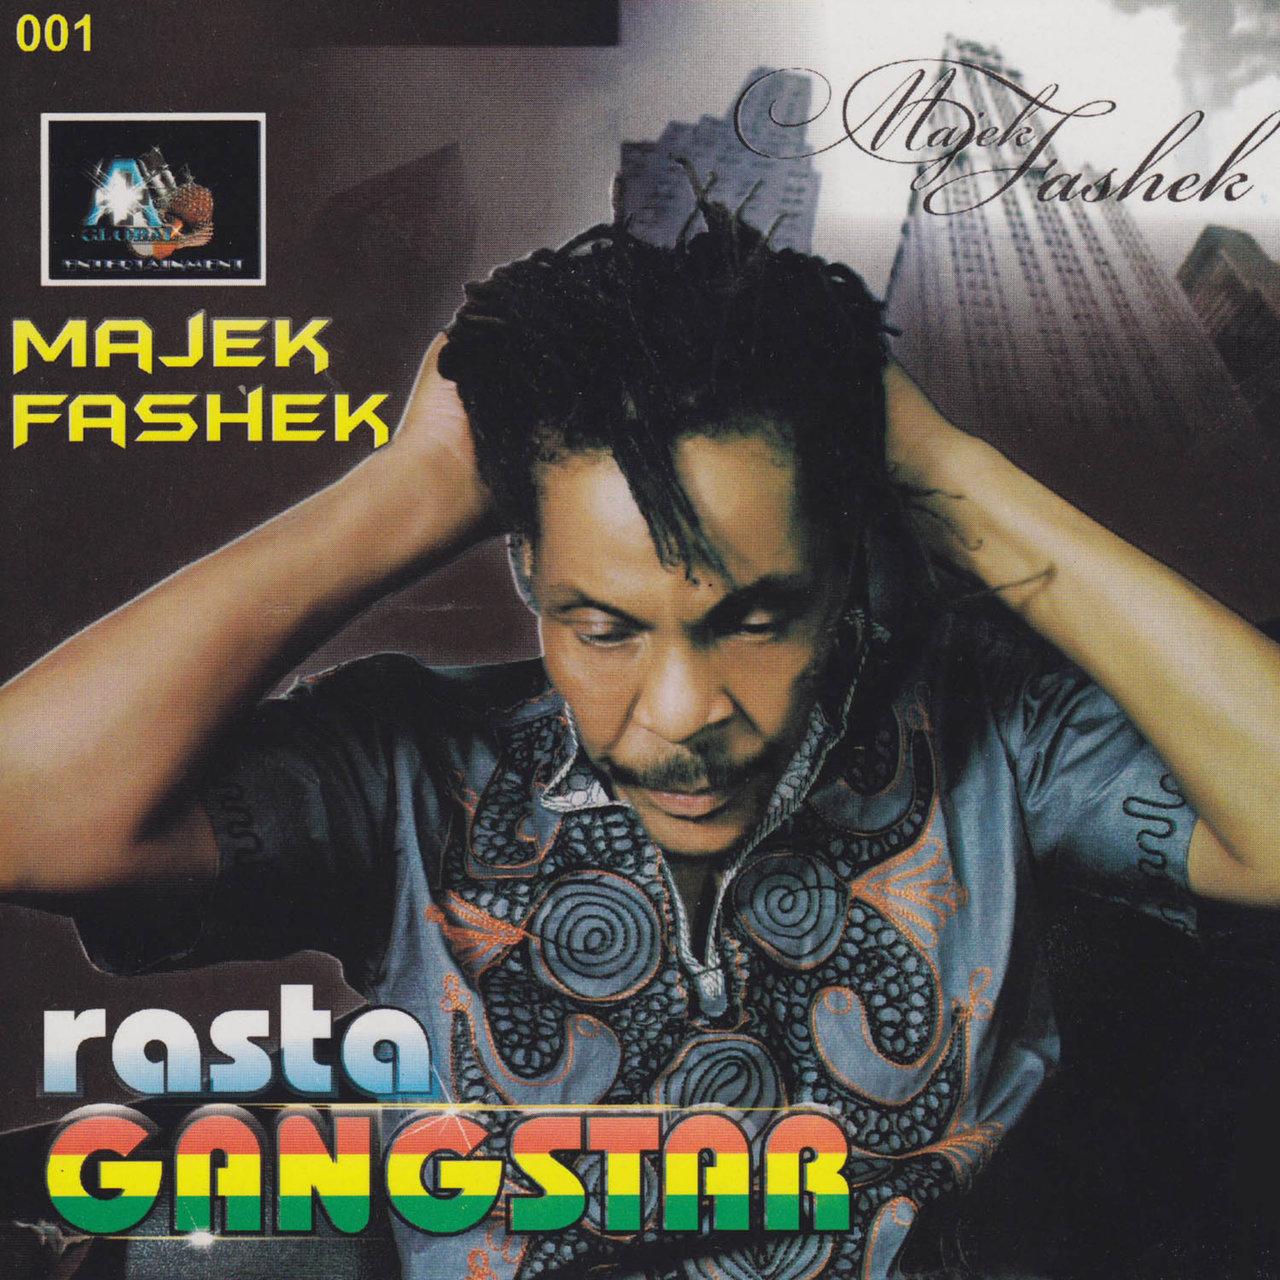 Rasta Gangstar by Majek Fashek on TIDAL